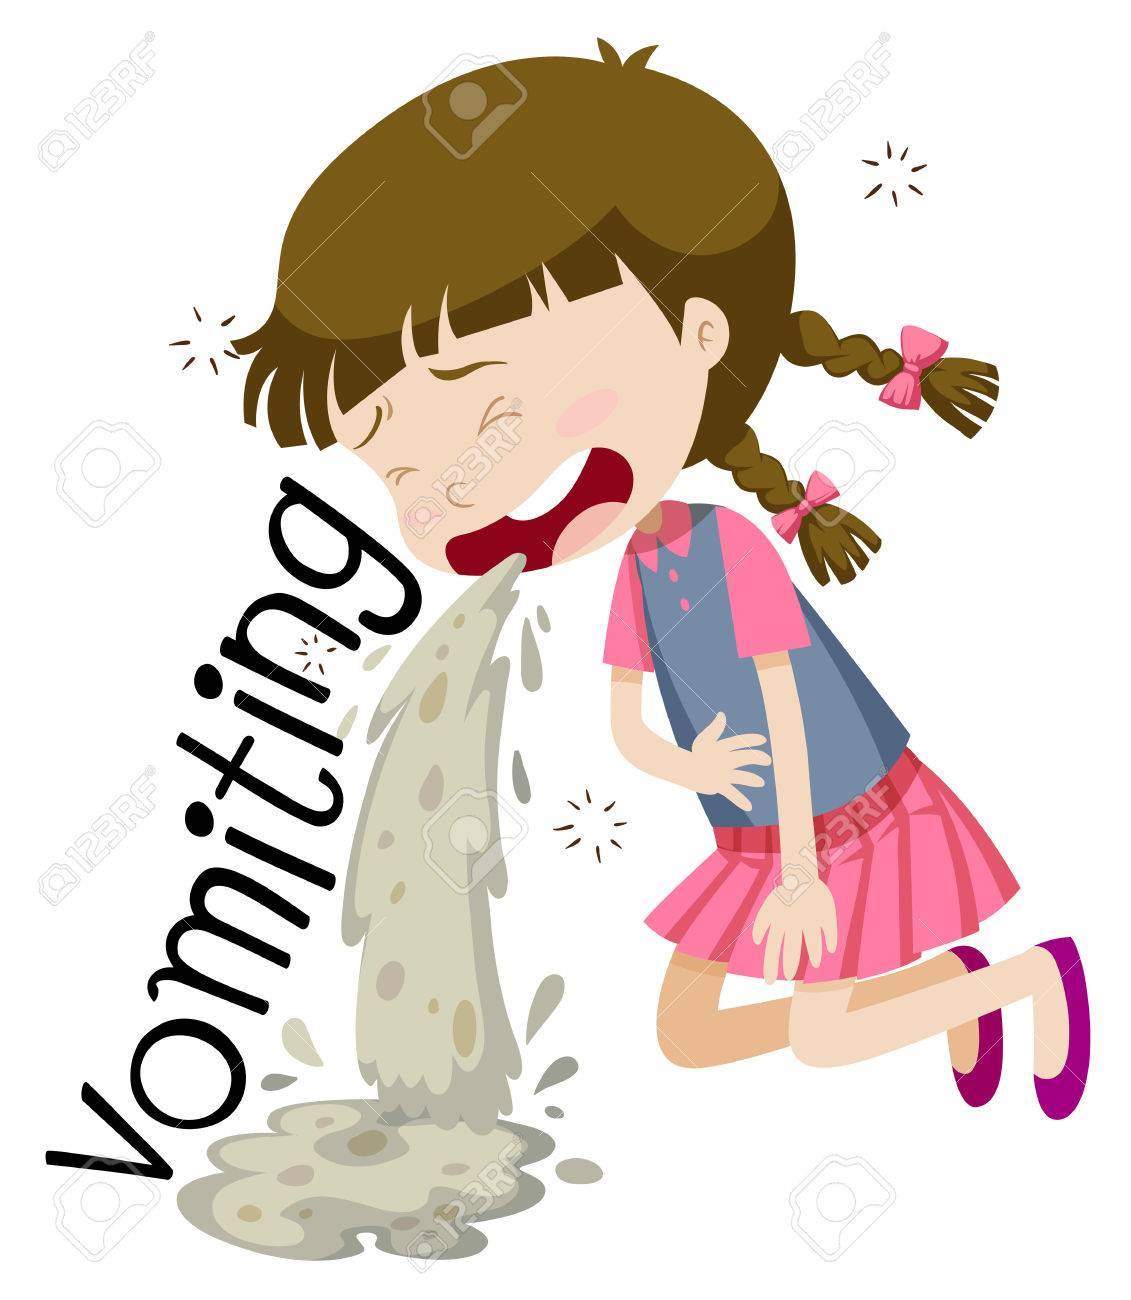 Girl vomiting and feeling sick illustration.